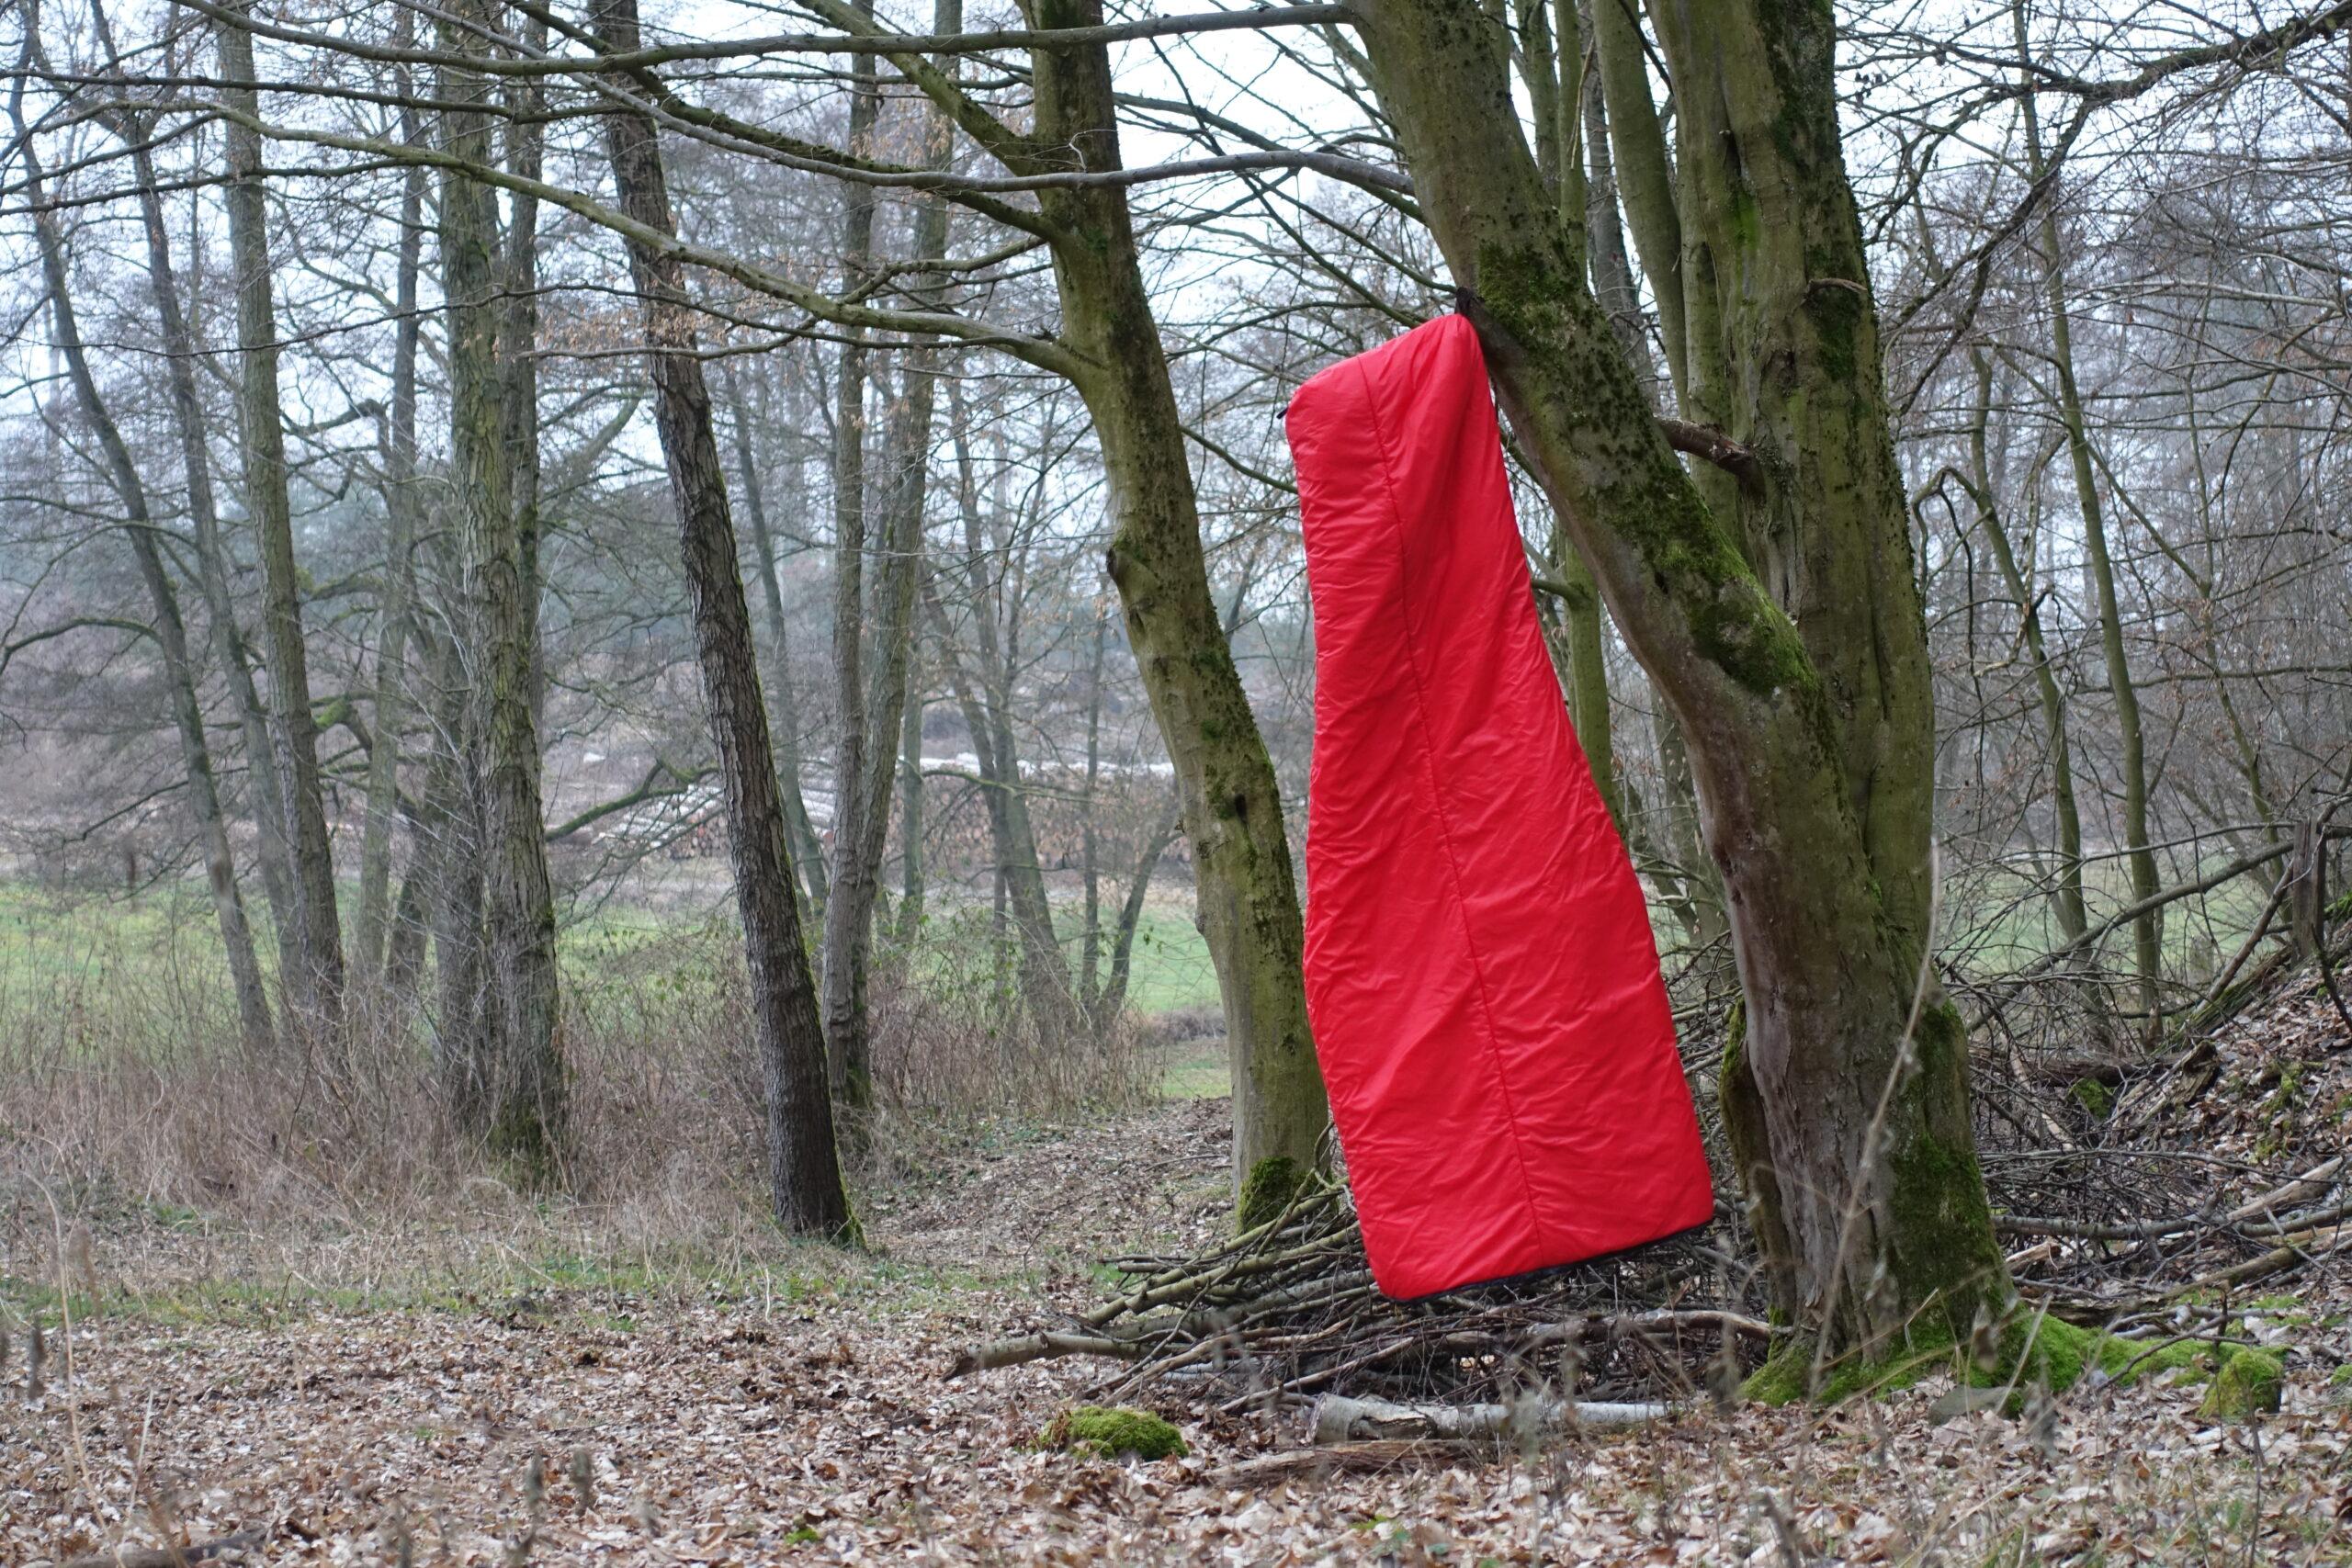 Schlafsack sleepingbag hanging